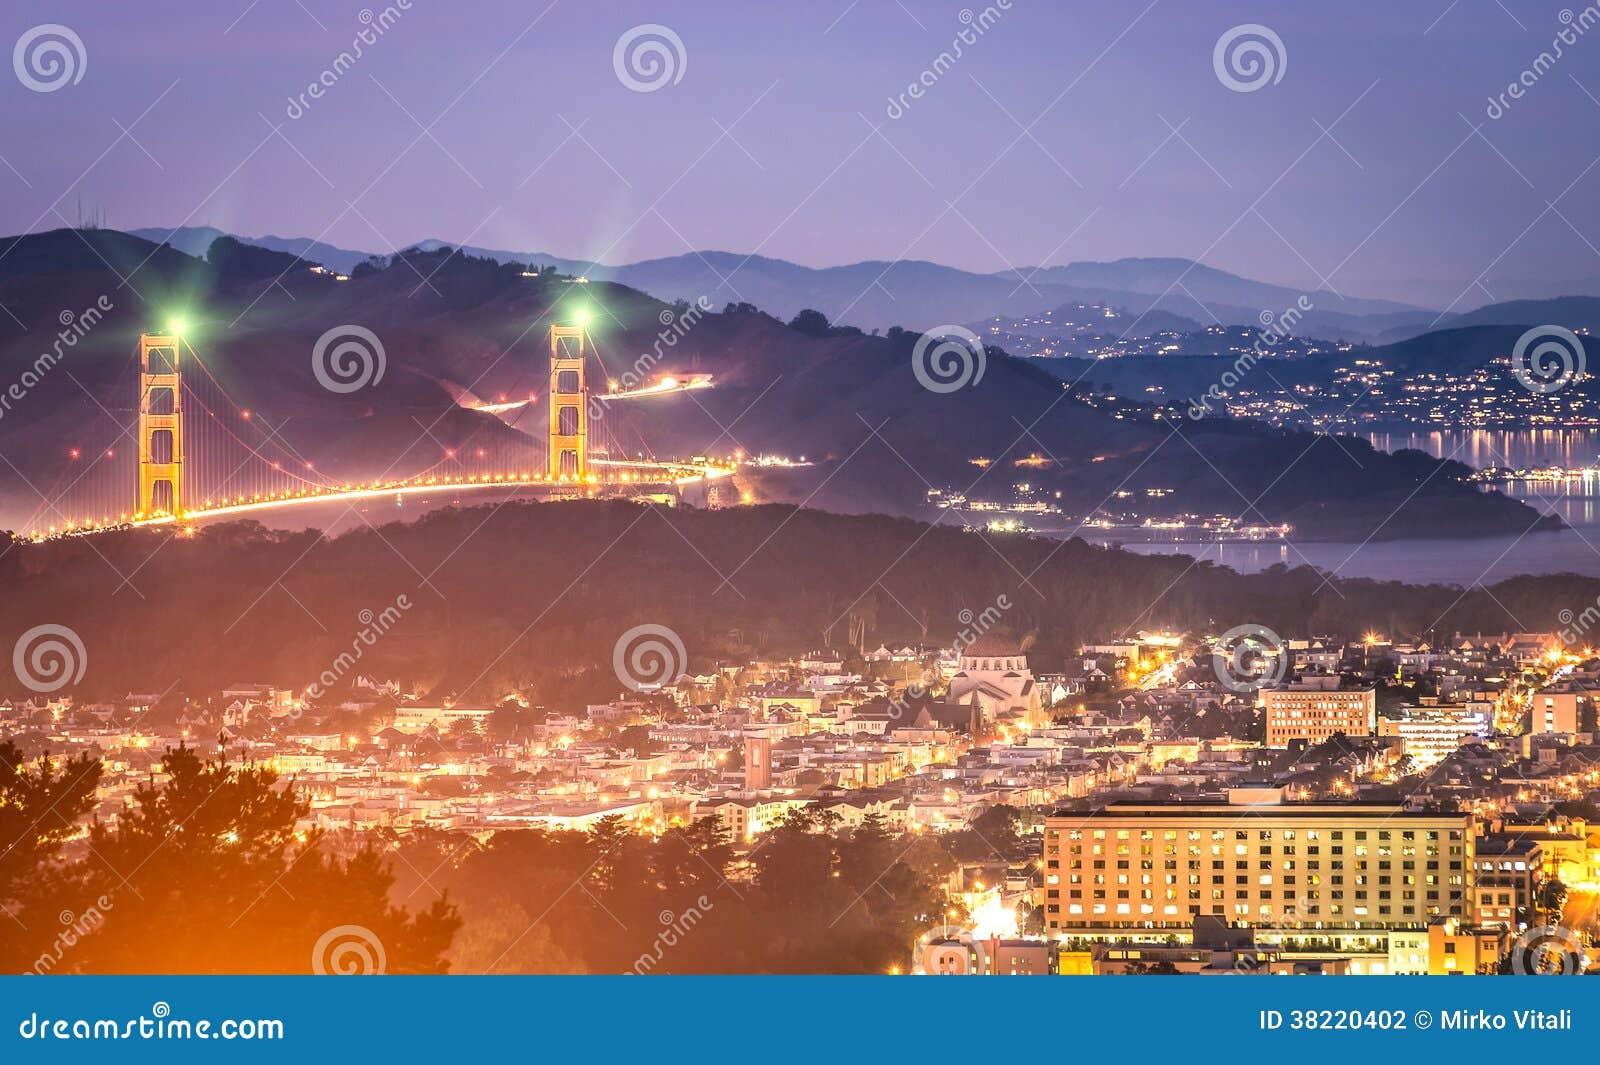 Golden gate bridge san francisco by night stock photo for Golden night